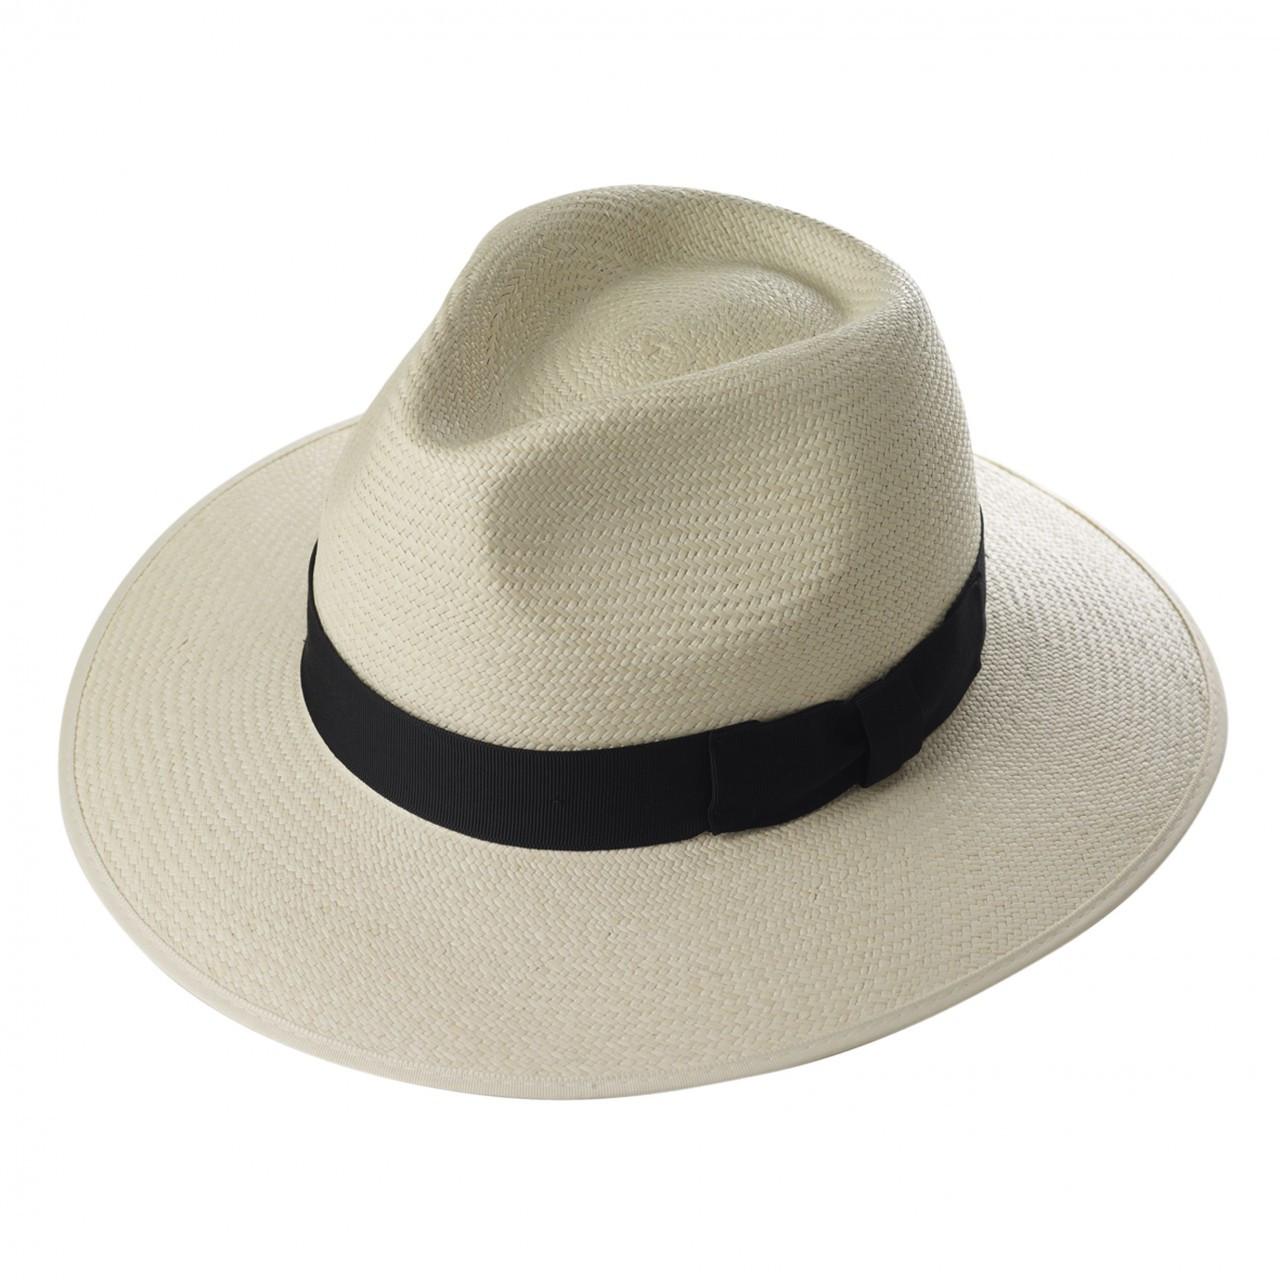 5d6f4c18bc7dc4 Down Brim Trilby Panama - Cuenca 3-5 - The Panama Hat Company